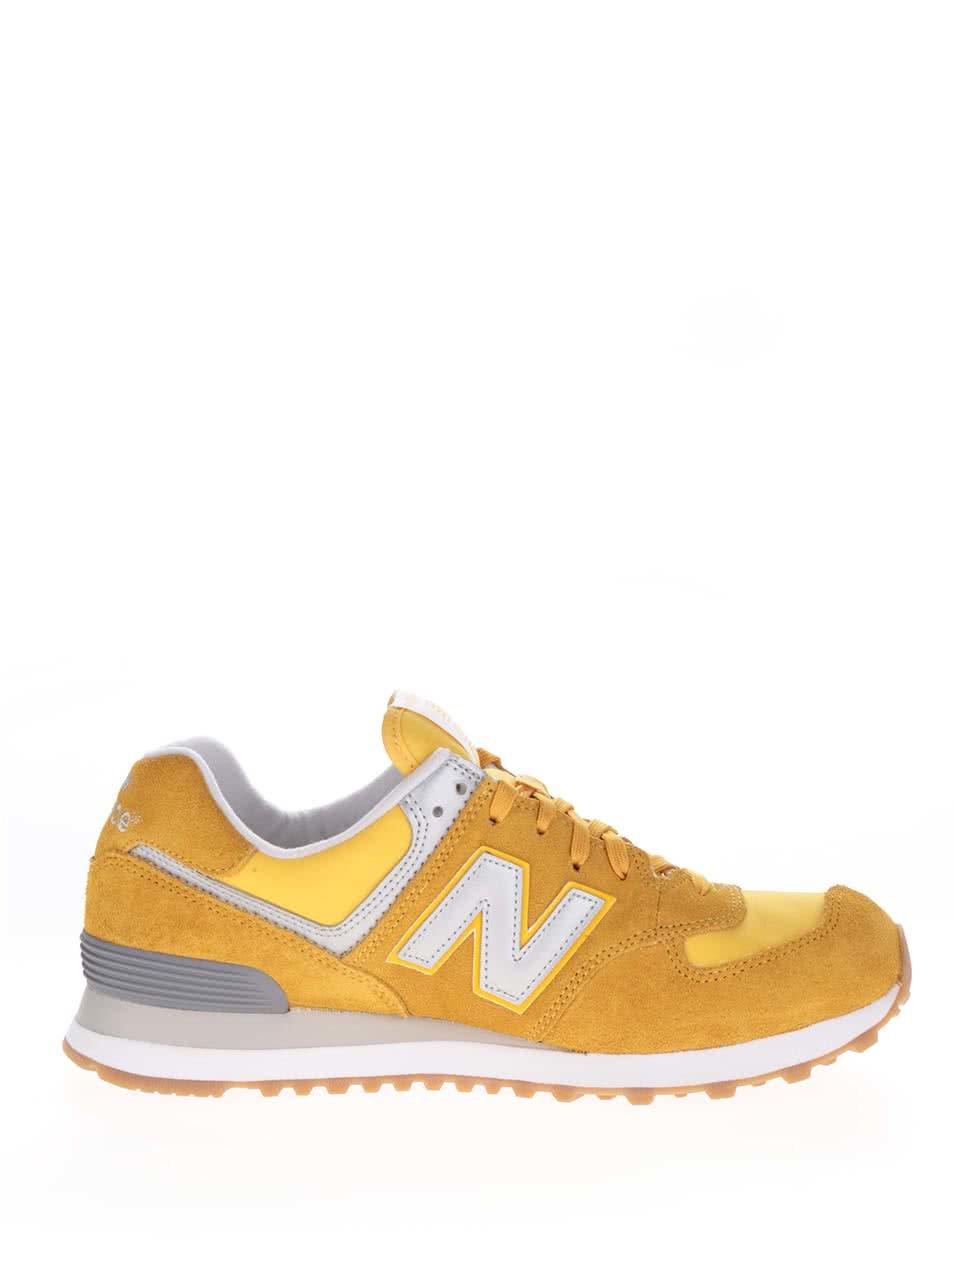 Žlté pánske semišové tenisky New Balance ... 0ed3f3368f5